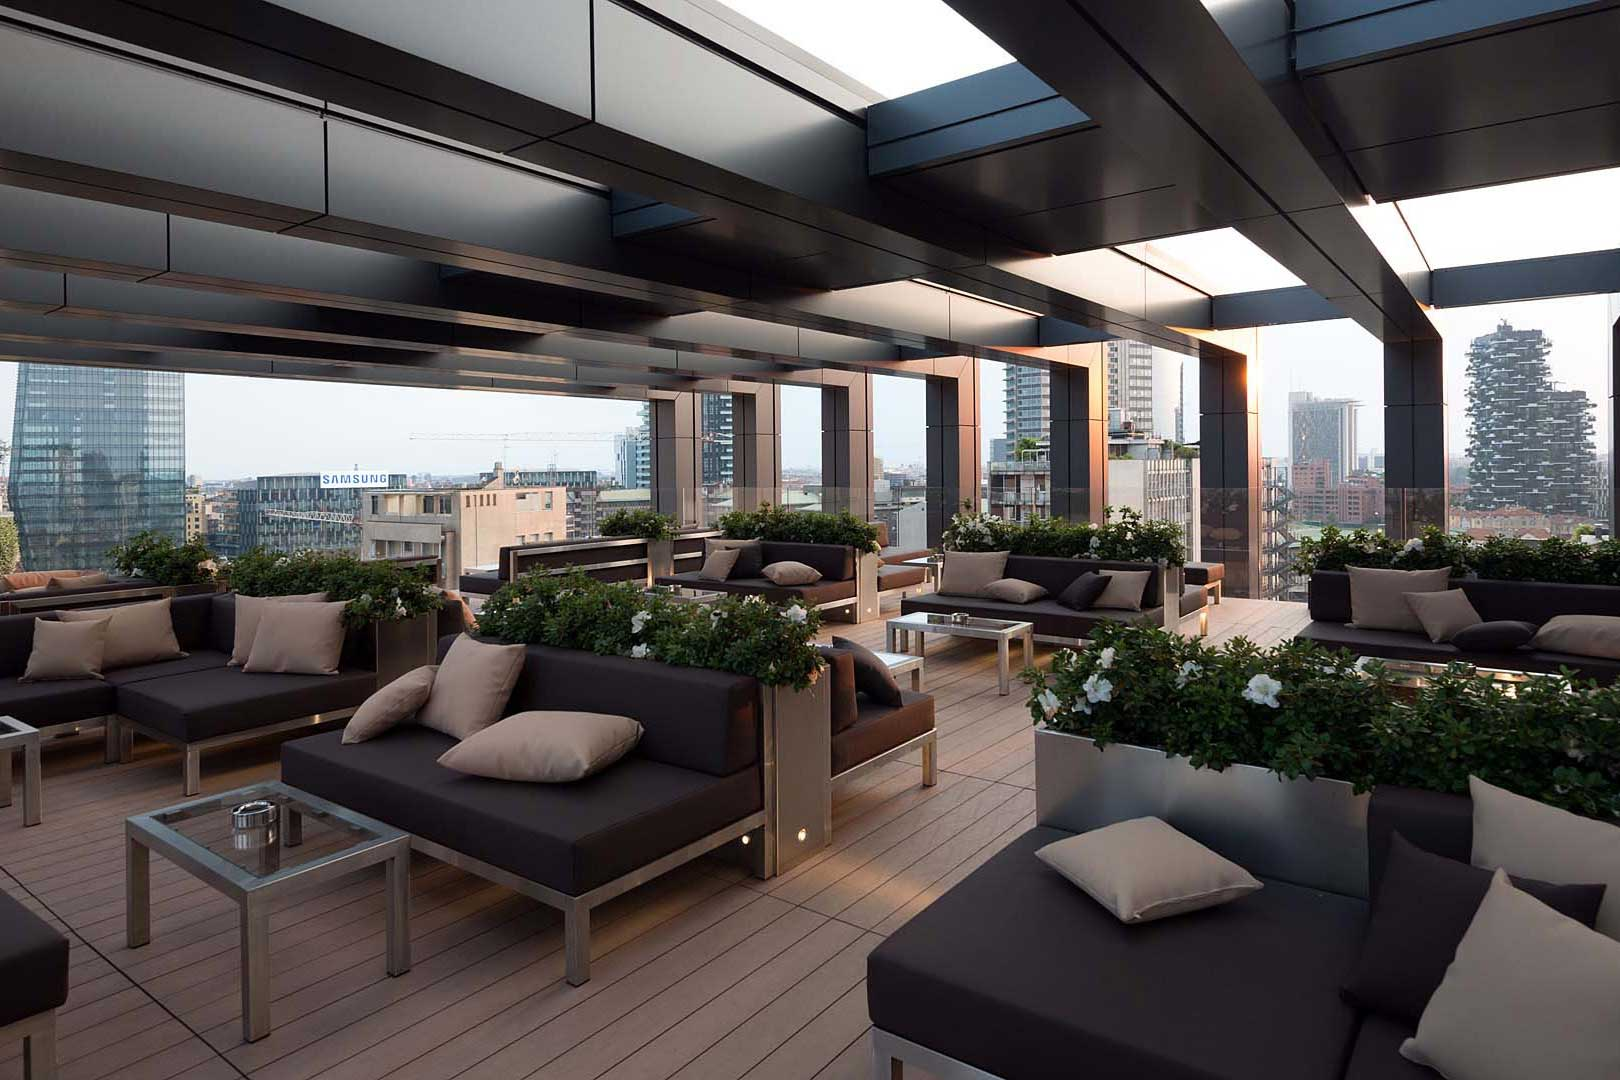 LaGare Rooftop Bar